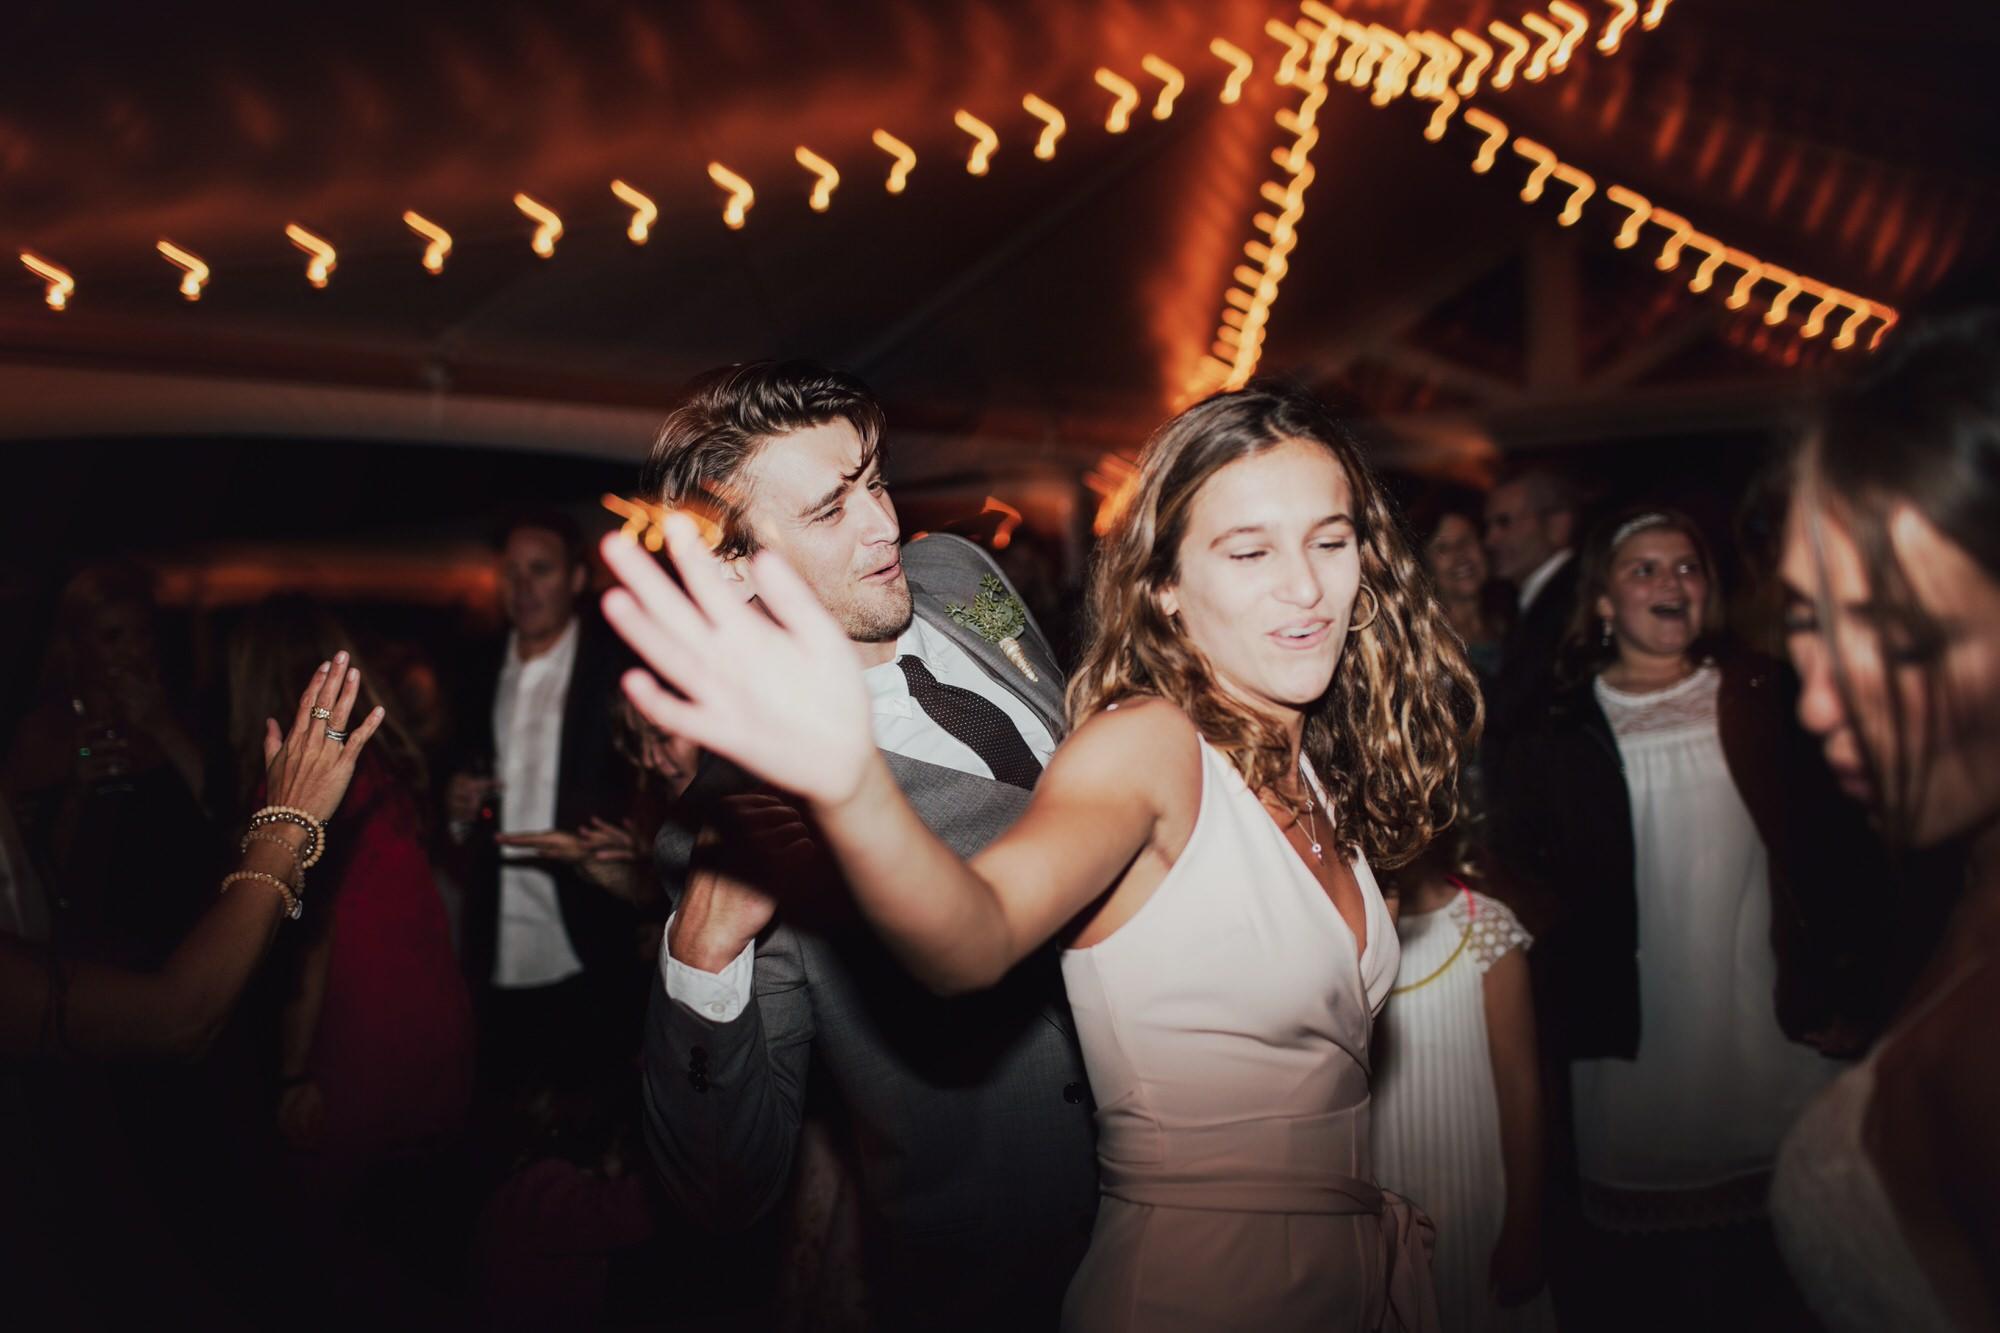 emily-aaron-rochester-new-york-wedding-photographer-134.JPG